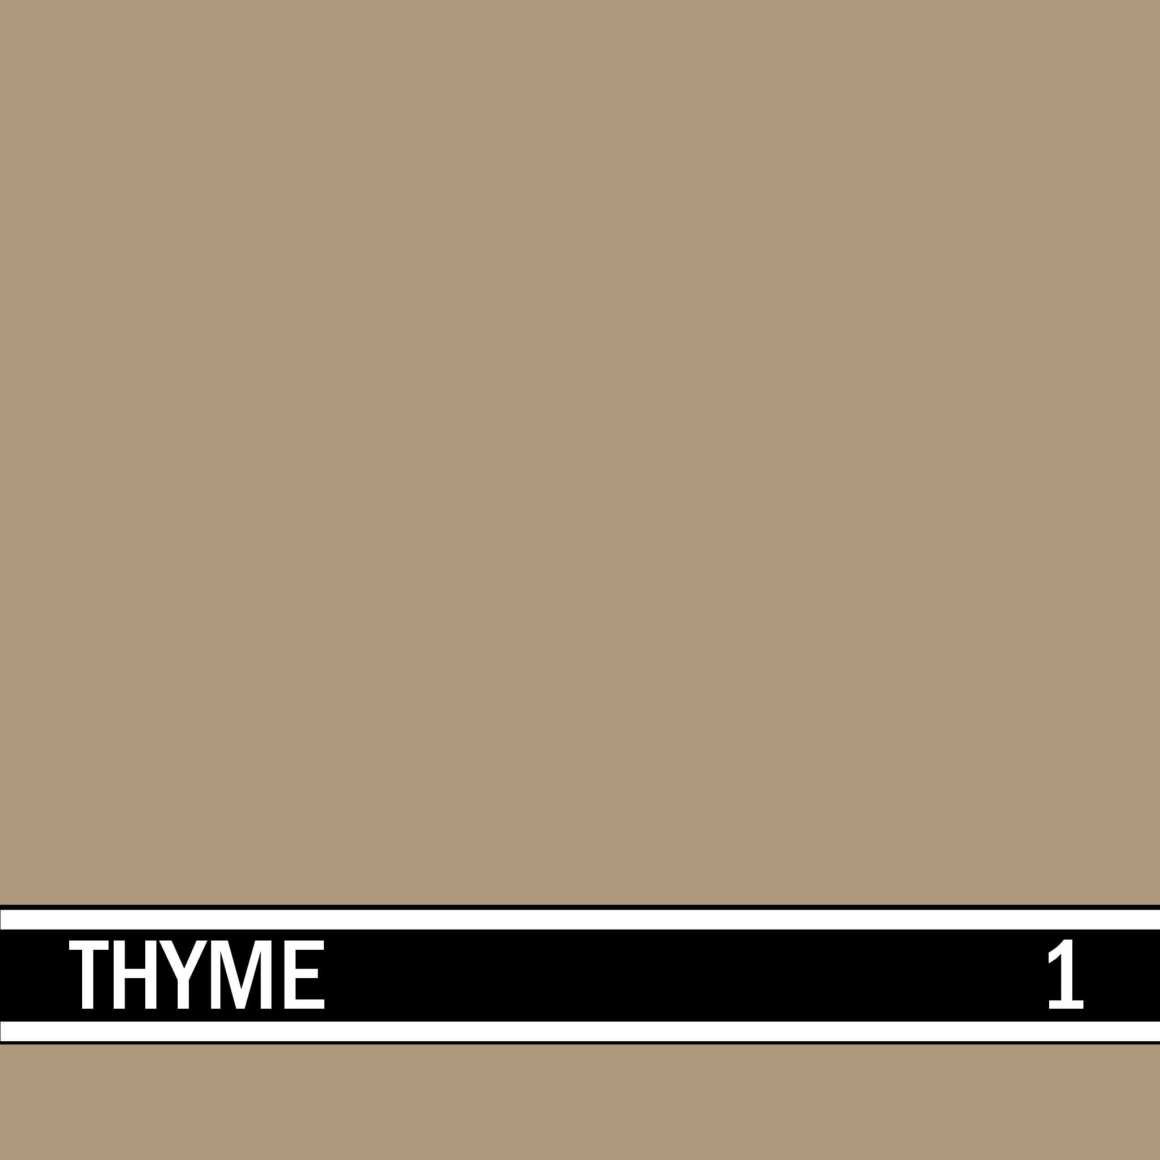 Thyme integral concrete color for stamped concrete and decorative colored concrete